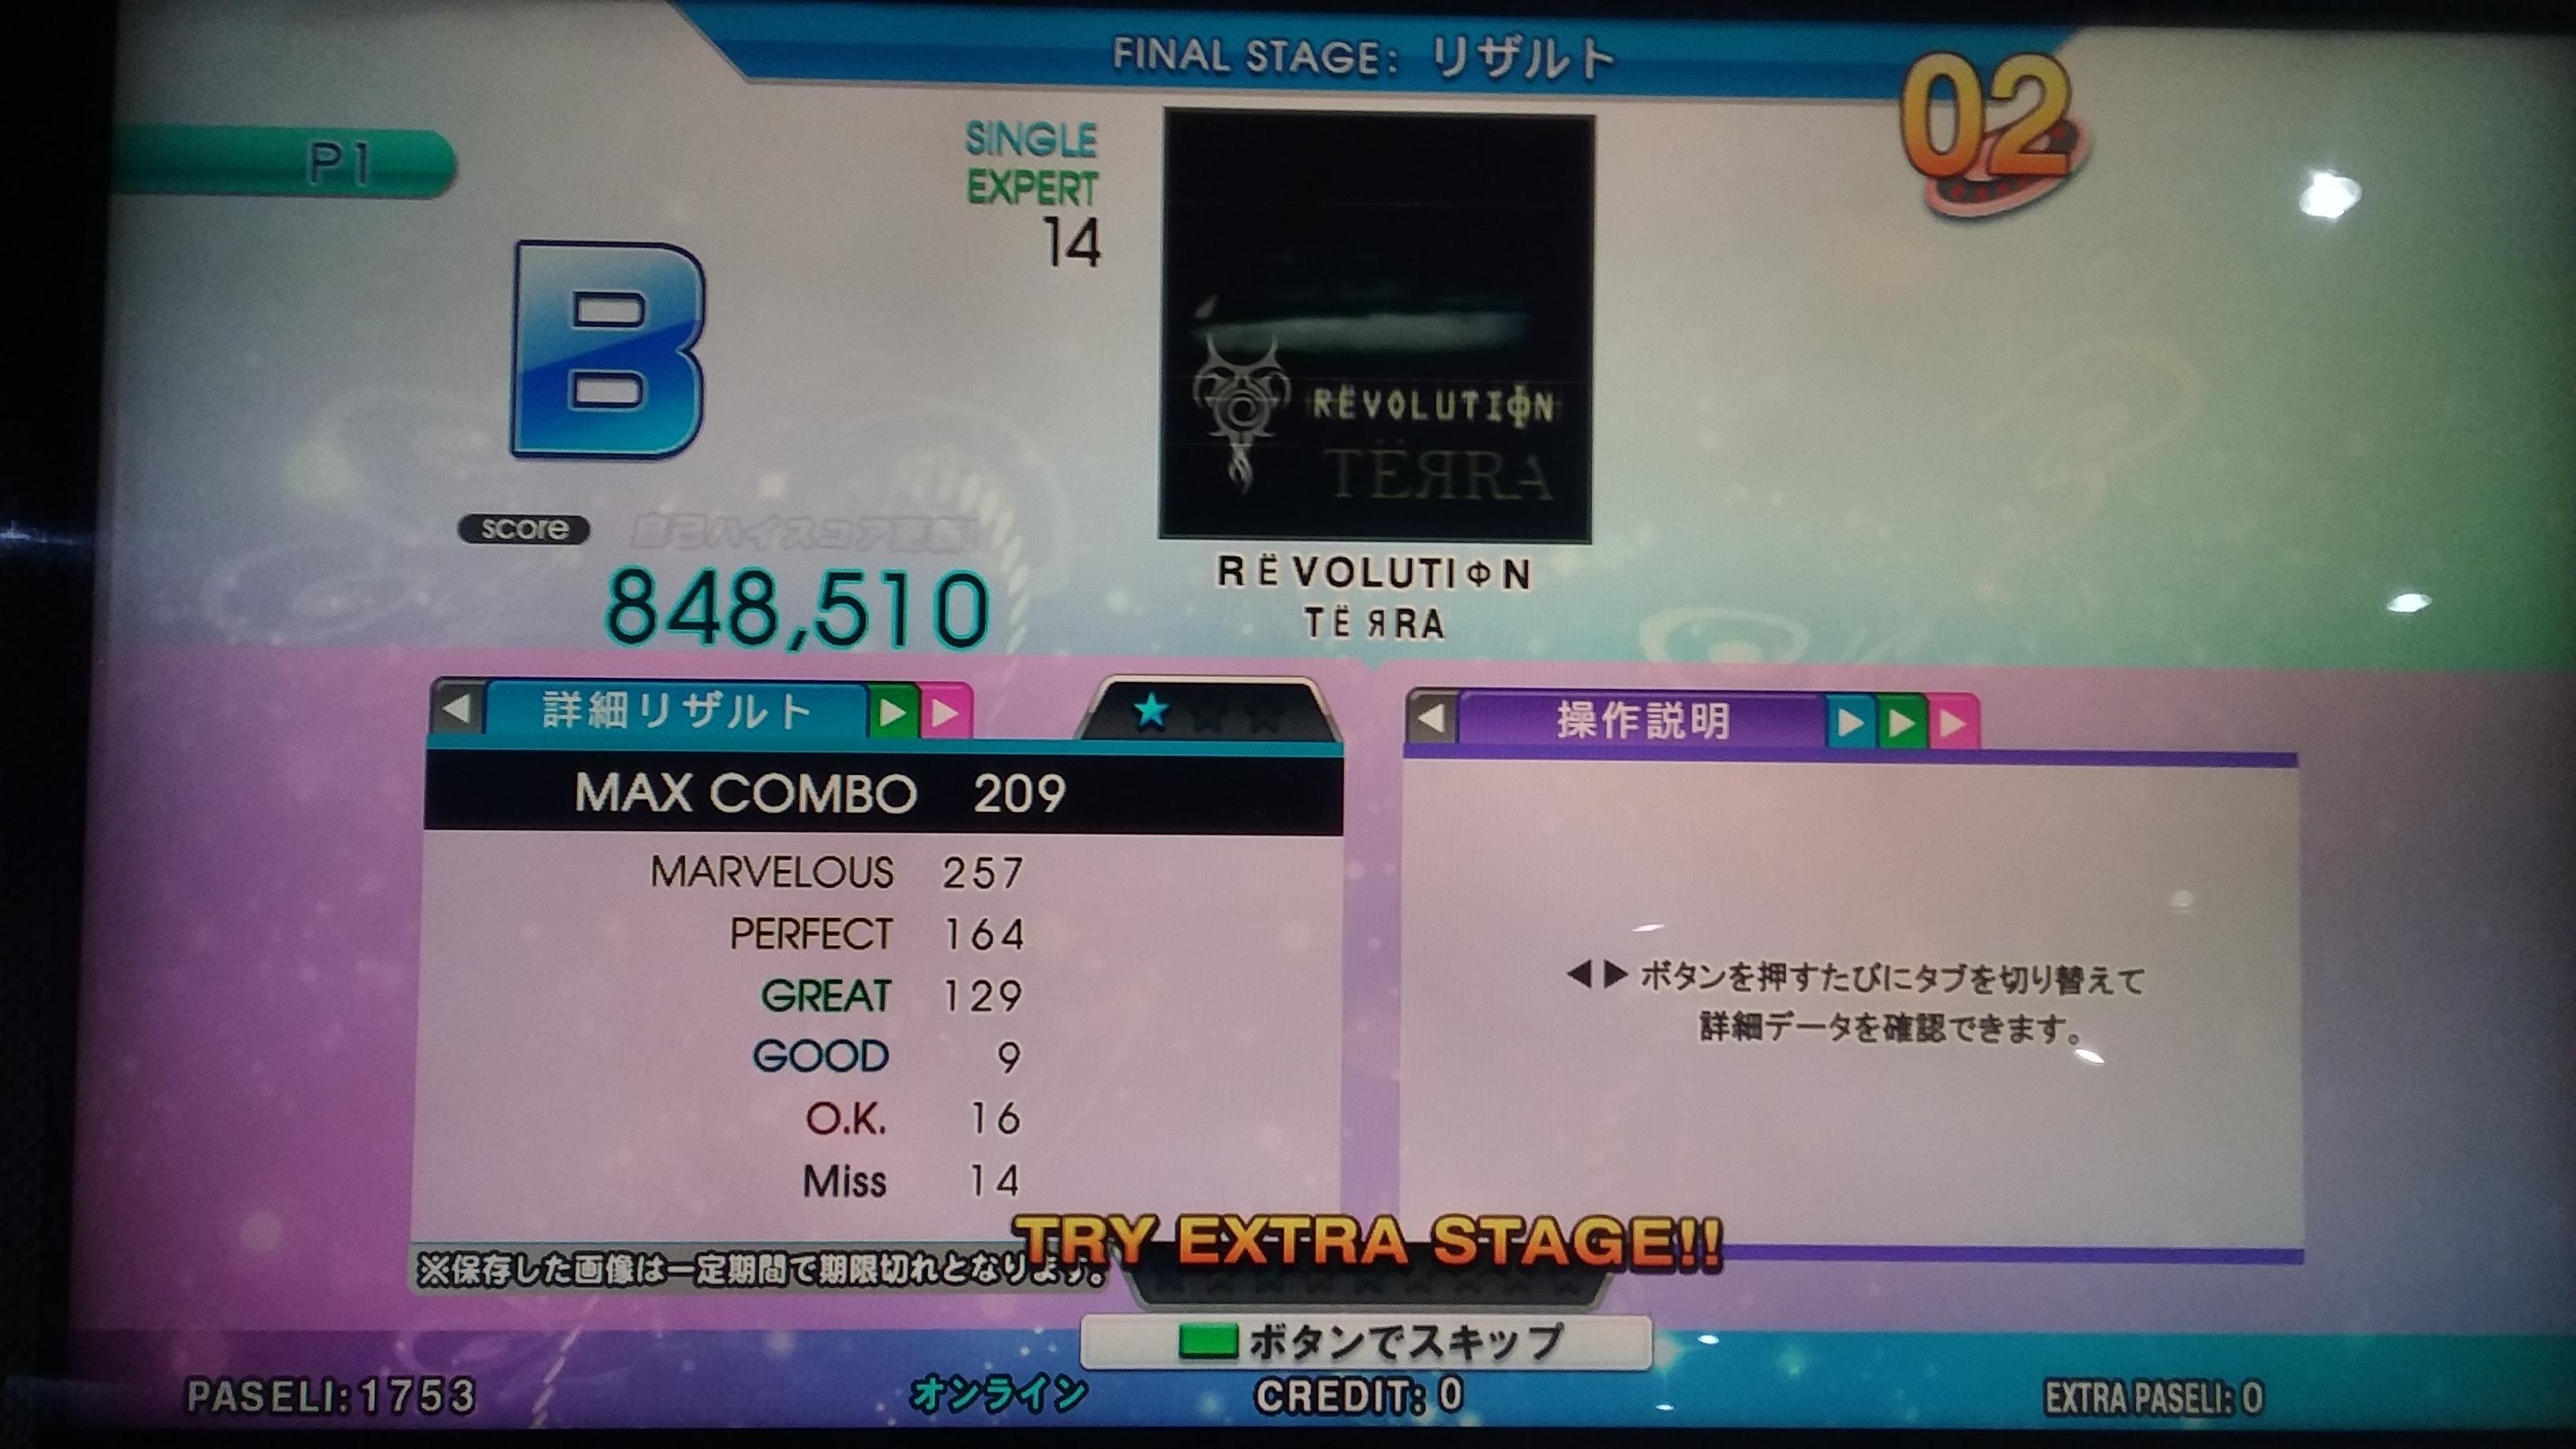 REVOLUTION(激)B